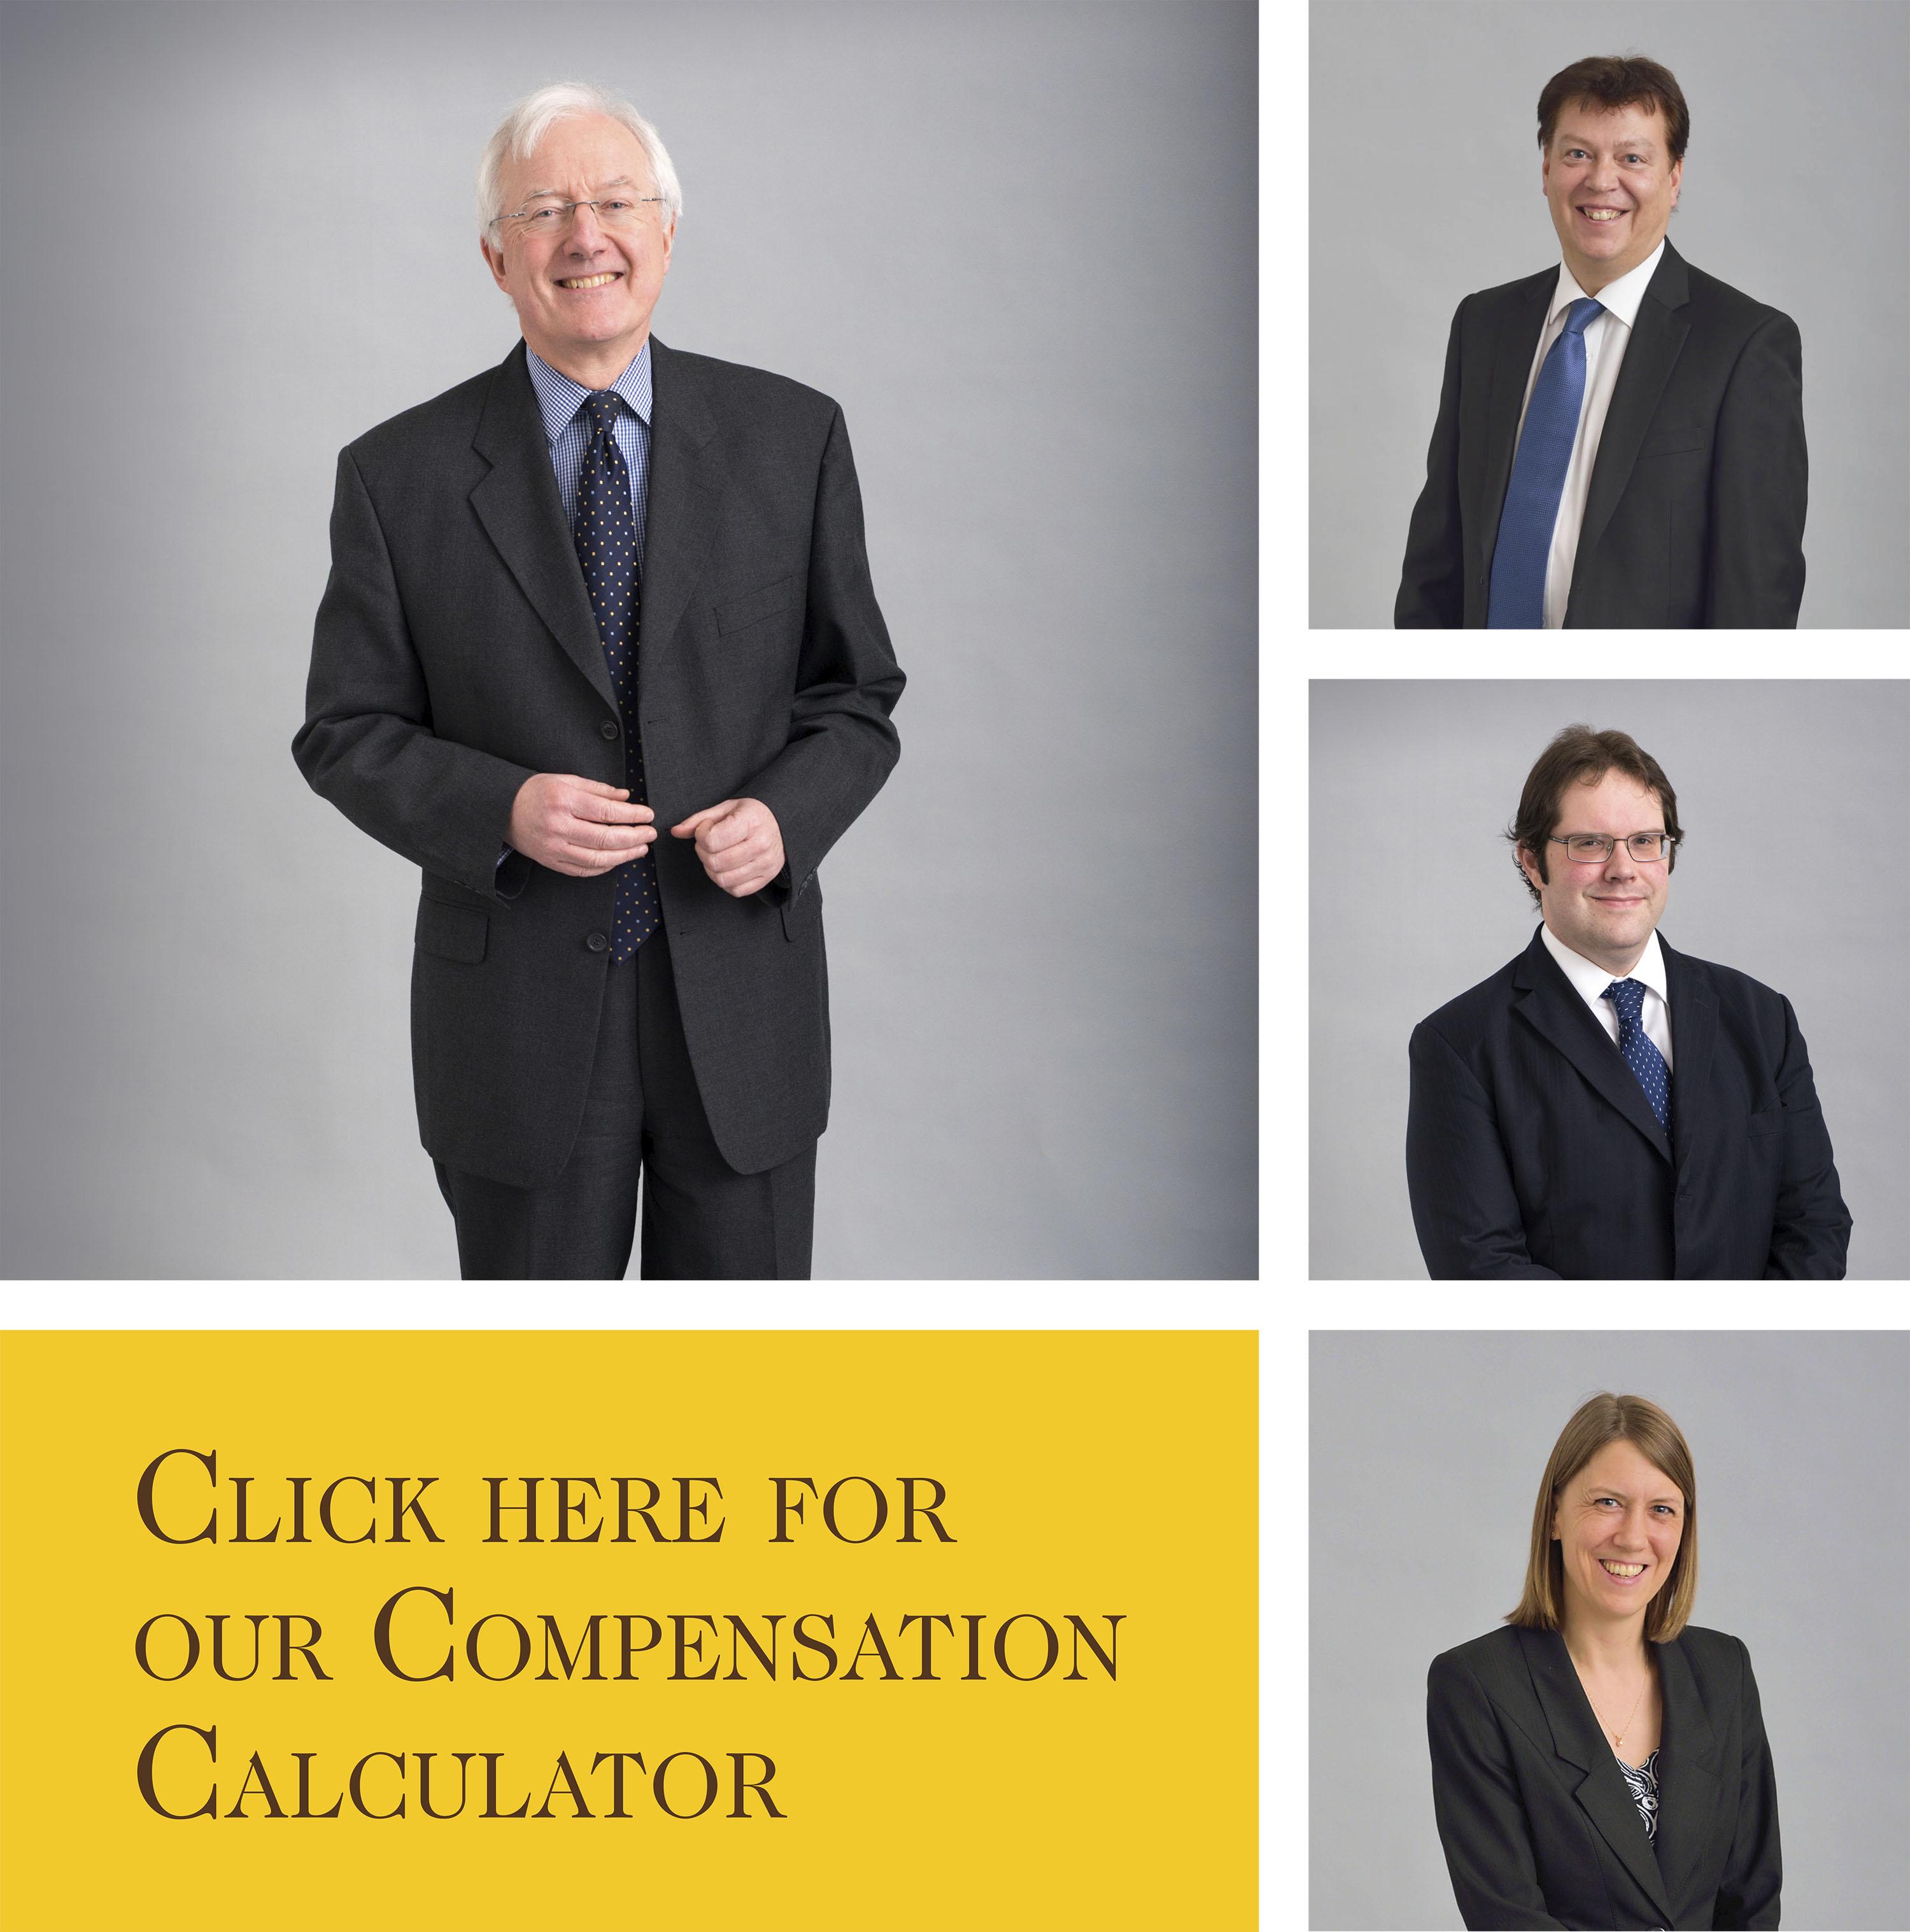 Clinical Negligence_Compensation Calculator_Mobile_Friendly